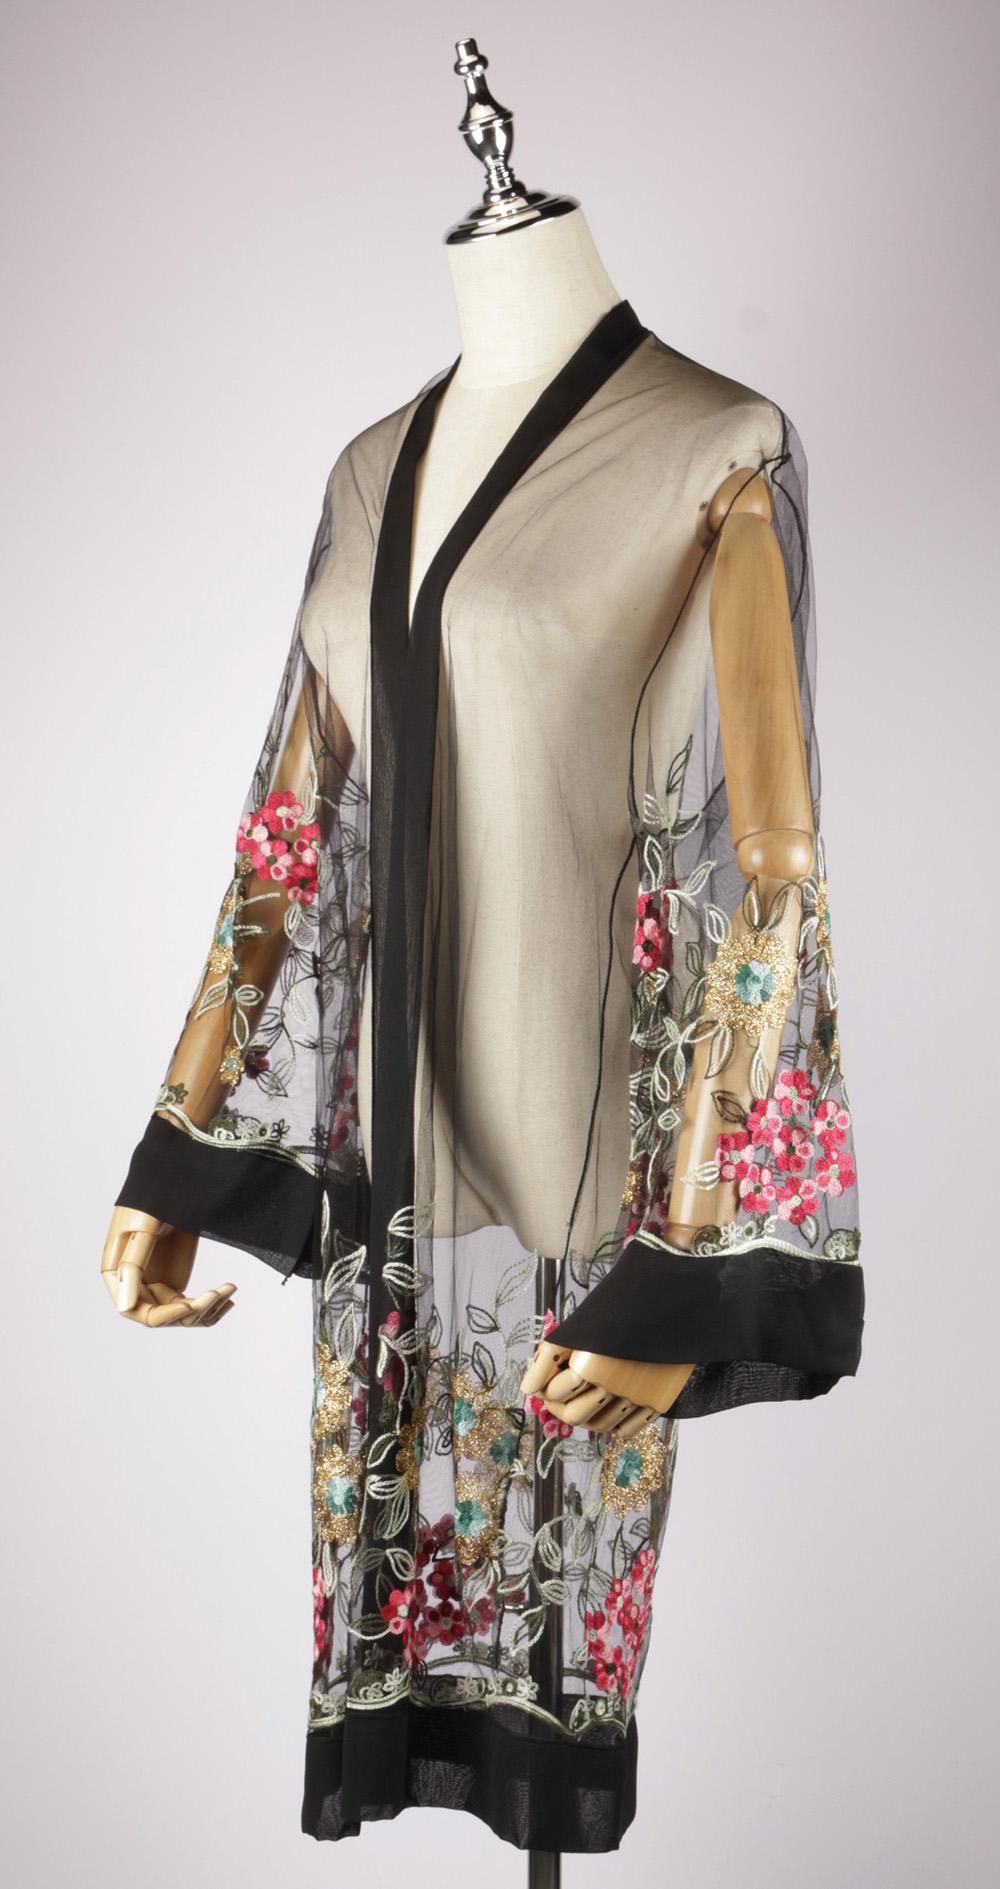 LEK2326 embroidered kimono side